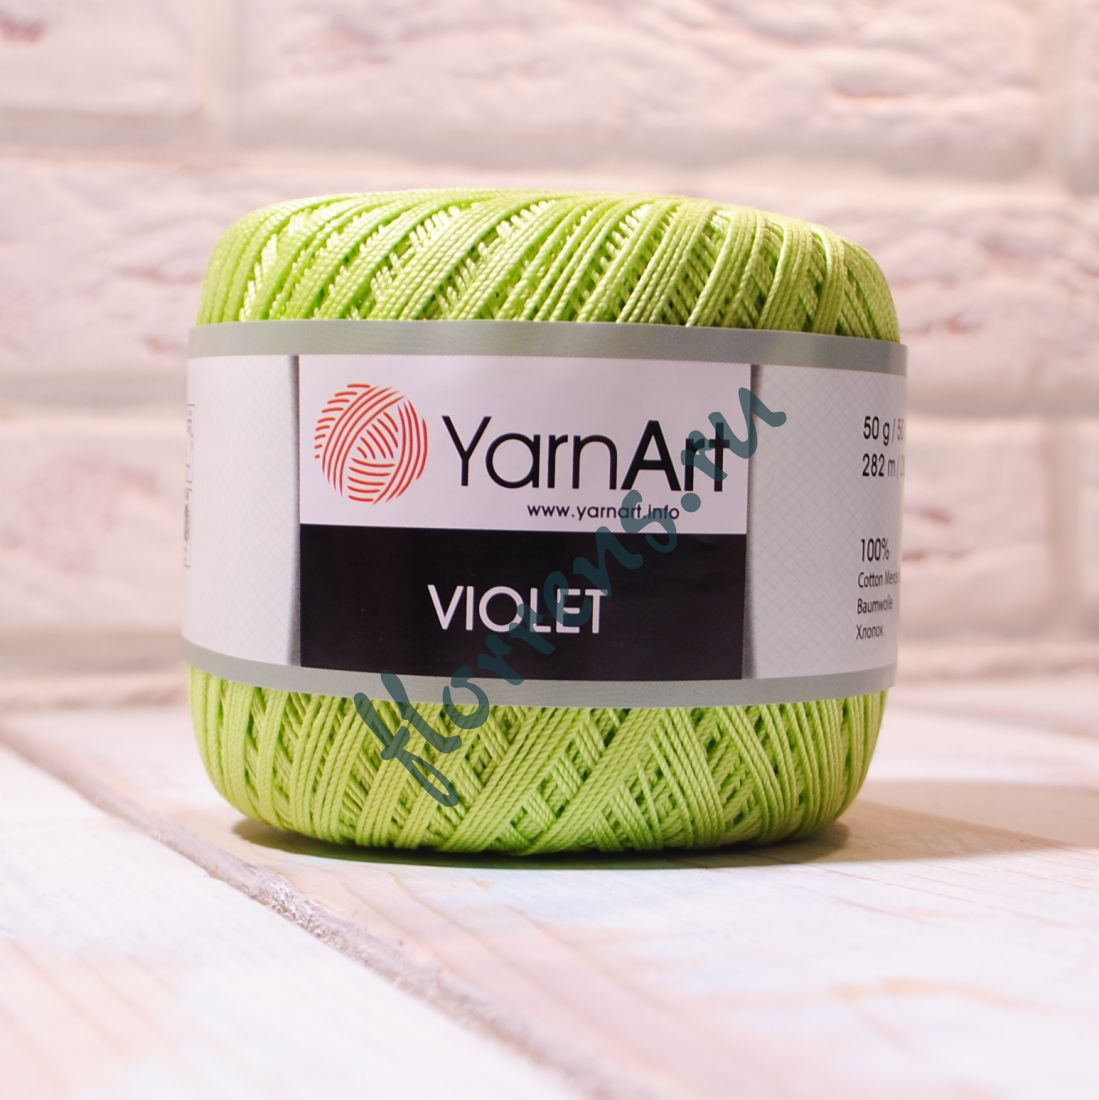 Пряжа YarnArt Violet / 5352 светло-зеленый